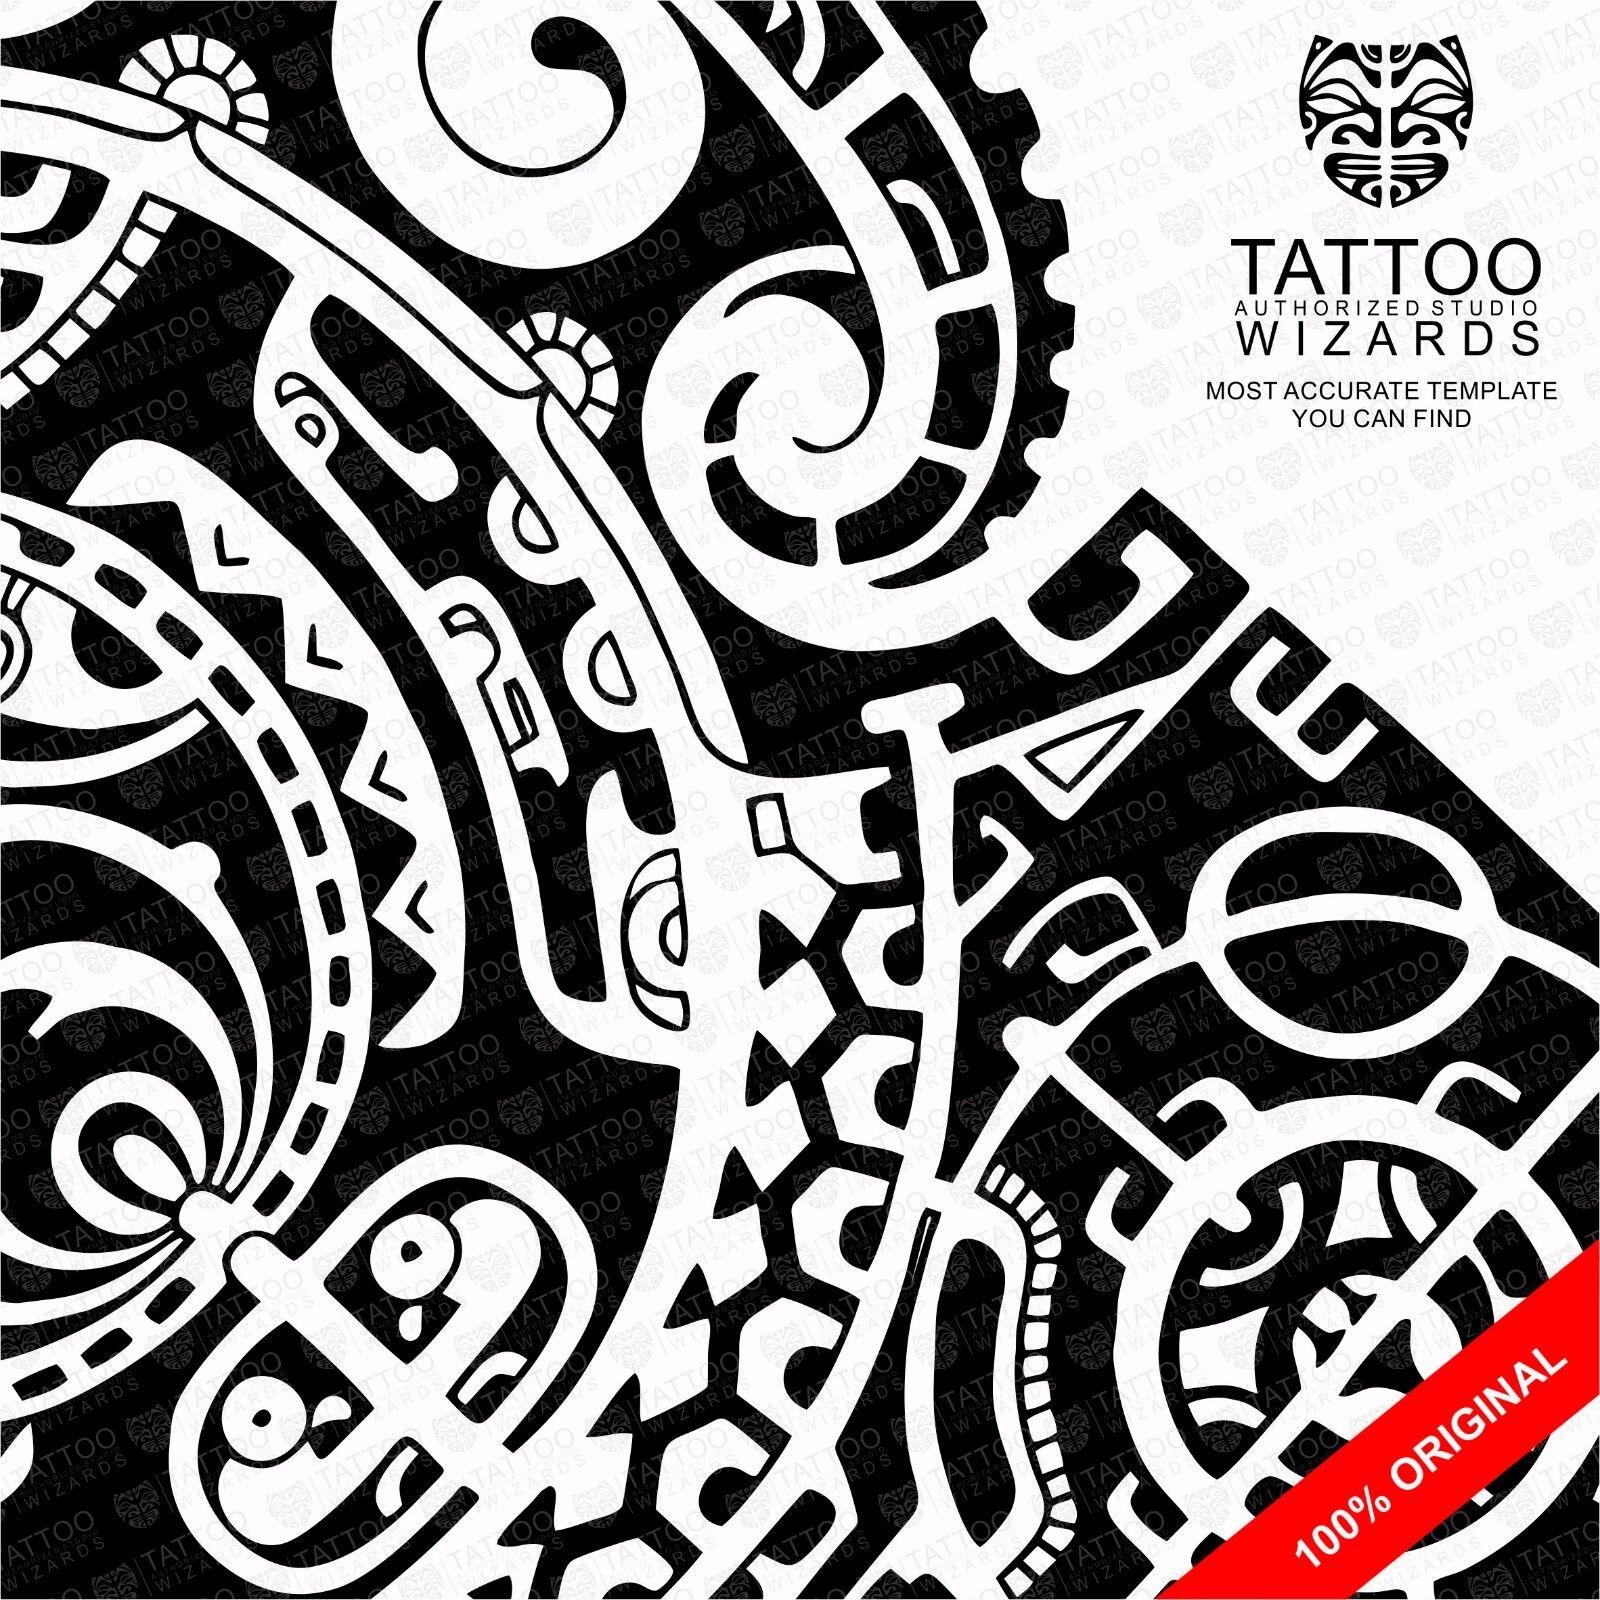 the rock dwayne johnson alike maori polynesian tattoo